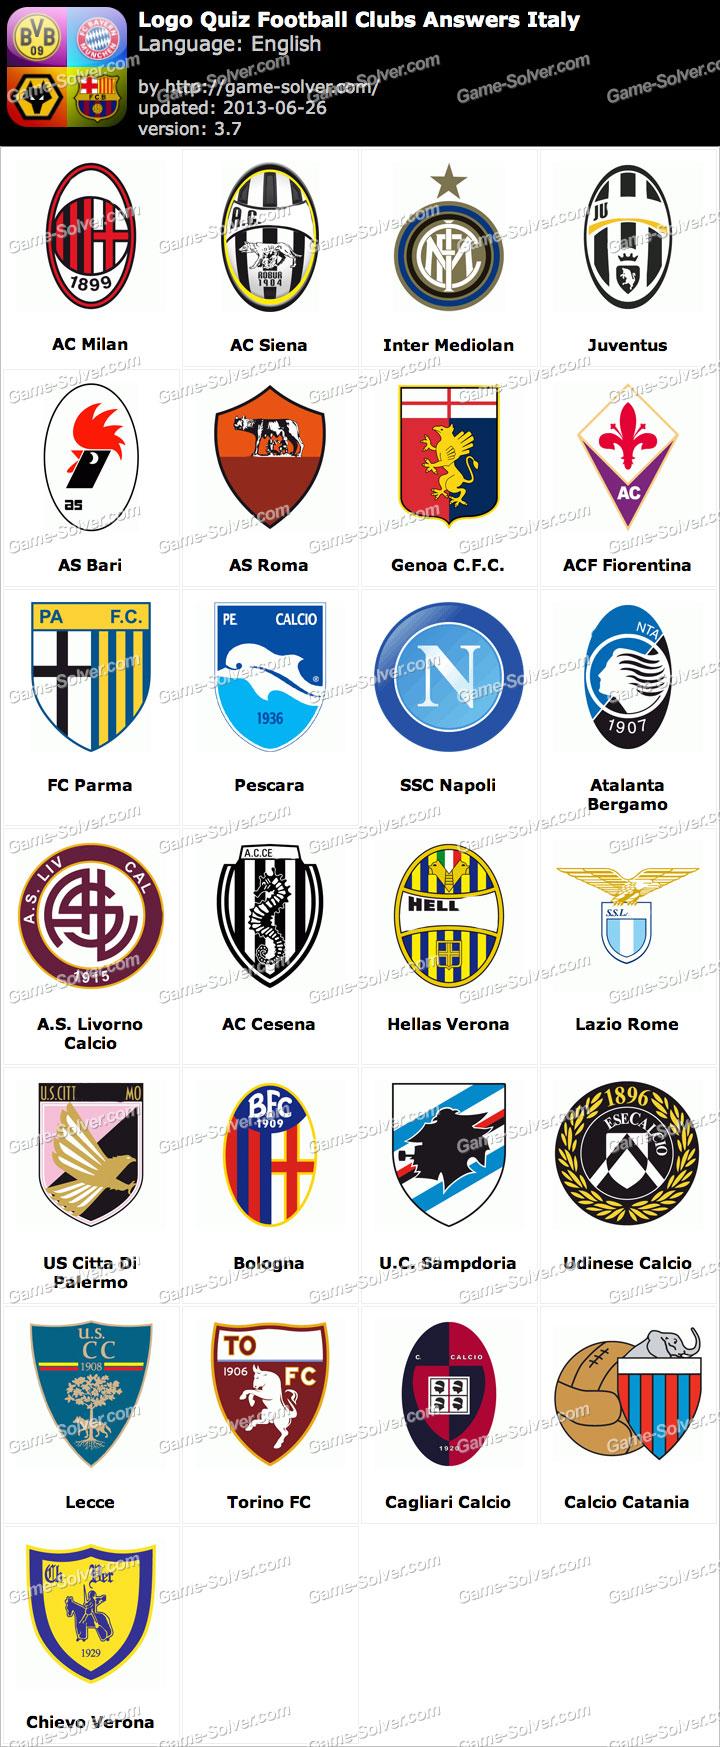 Logo Quiz Football Clubs Answers Italy